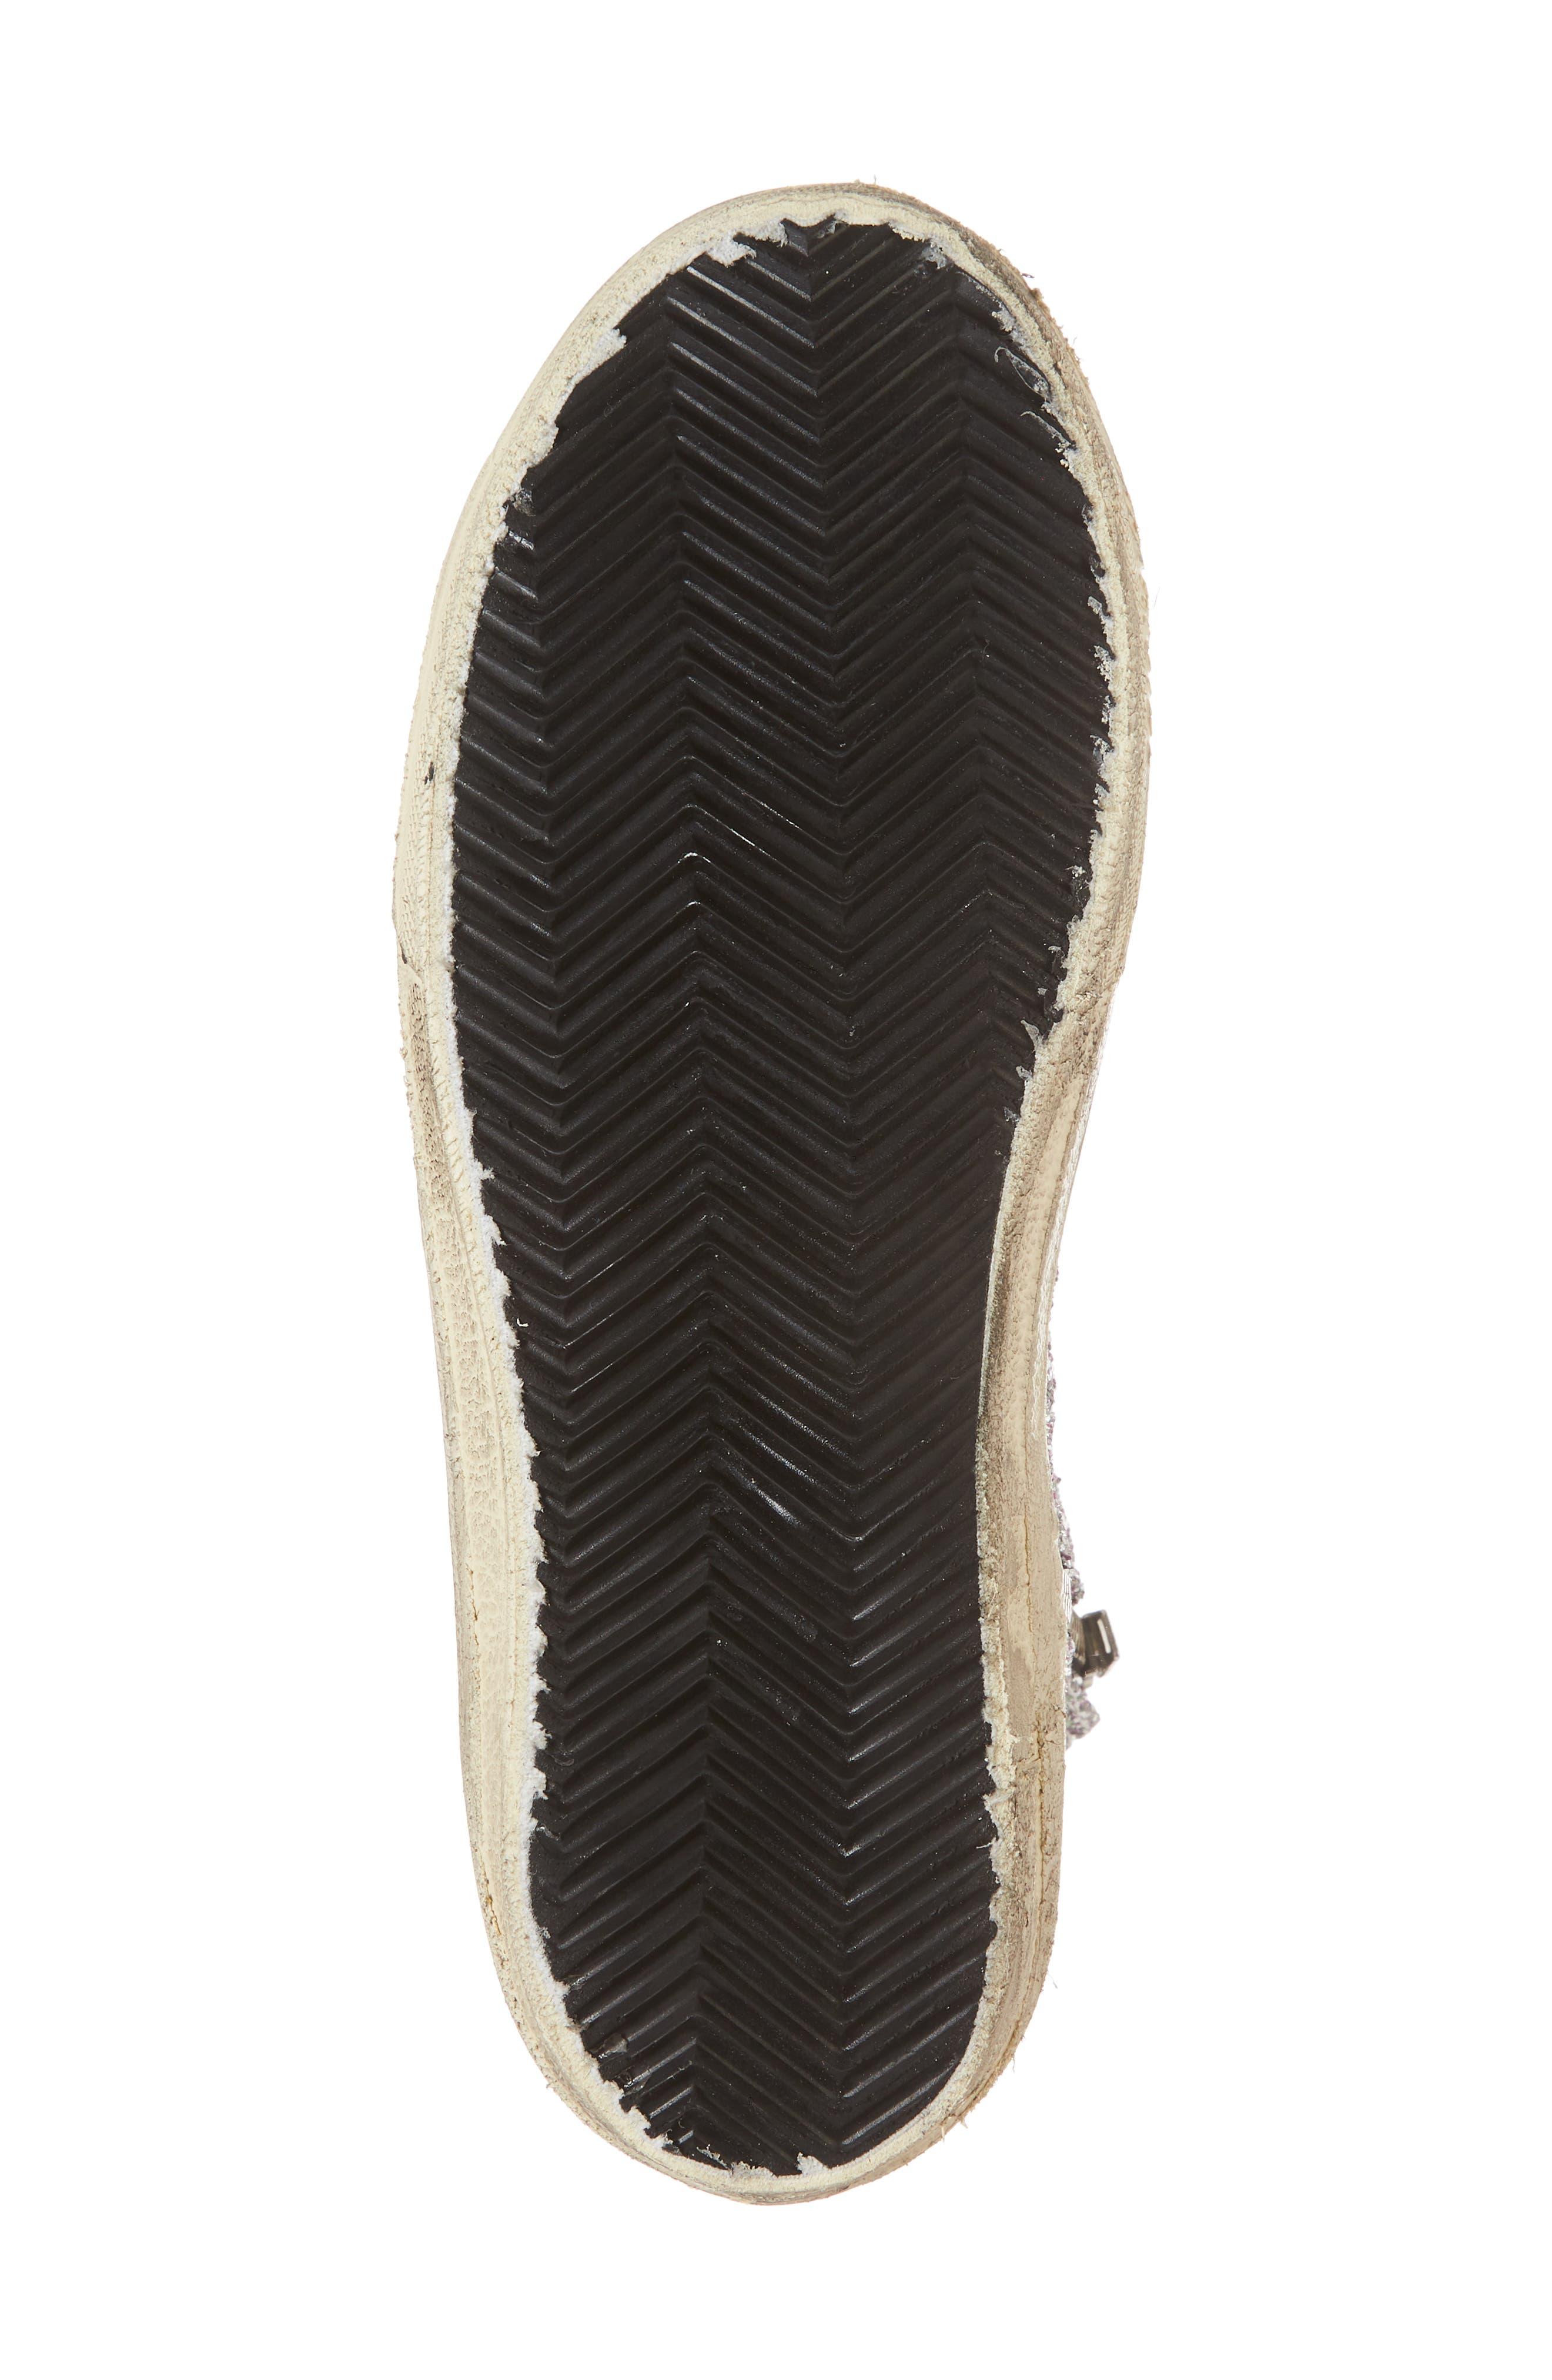 Slide High Top Sneaker,                             Alternate thumbnail 6, color,                             Bordeaux / Pink/ Gold